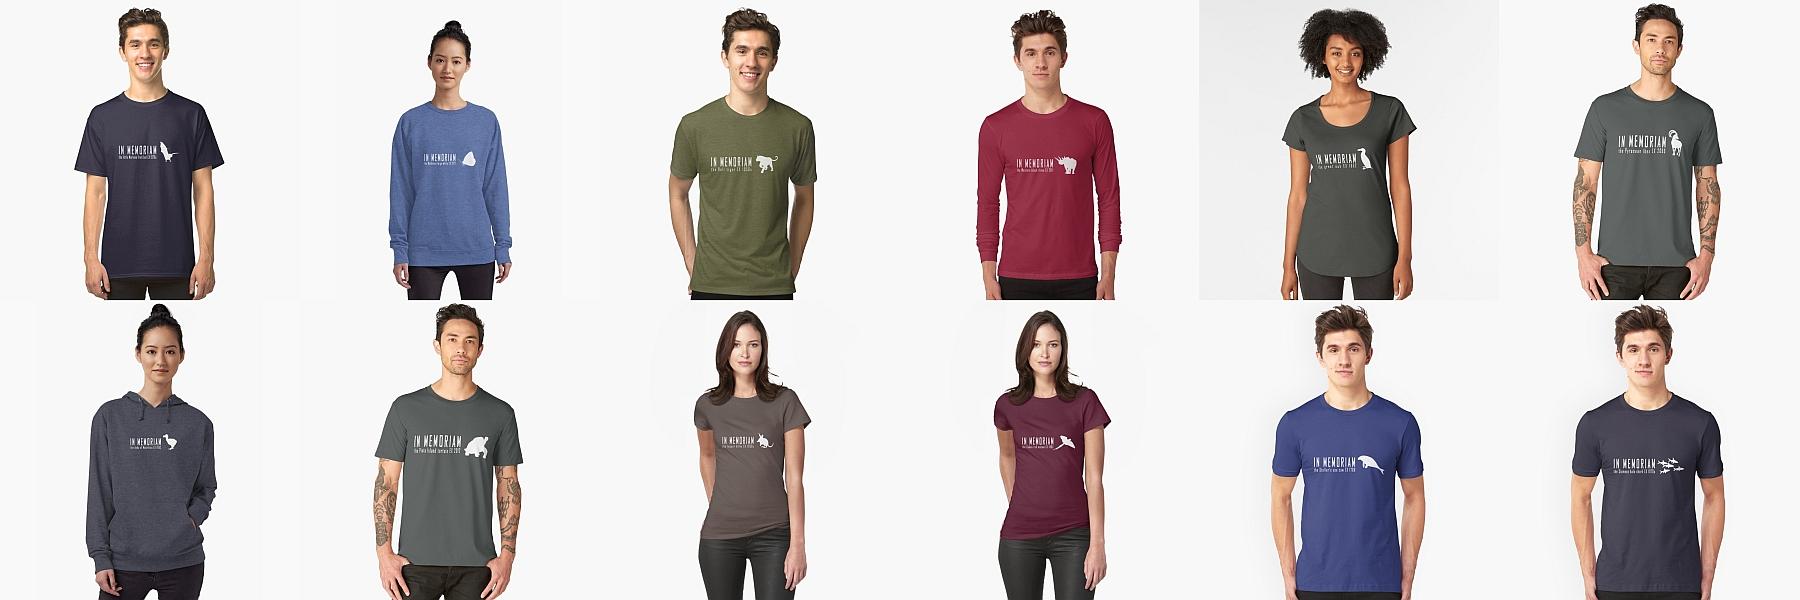 save planet wildlife animals earth t-shirt